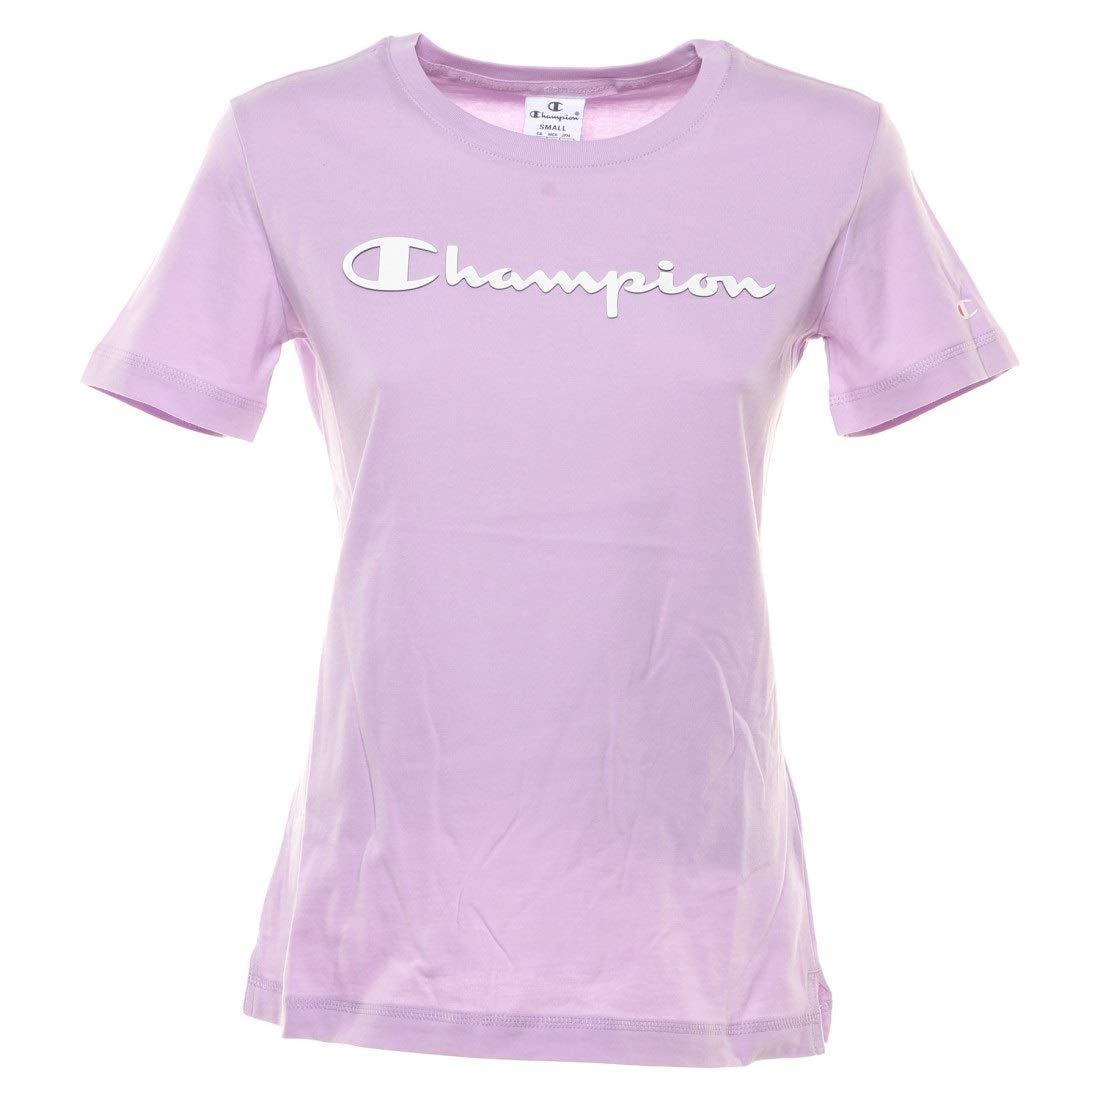 Champion T-Shirt Damen 111924 S19 BS501 NNY Dunkelblau